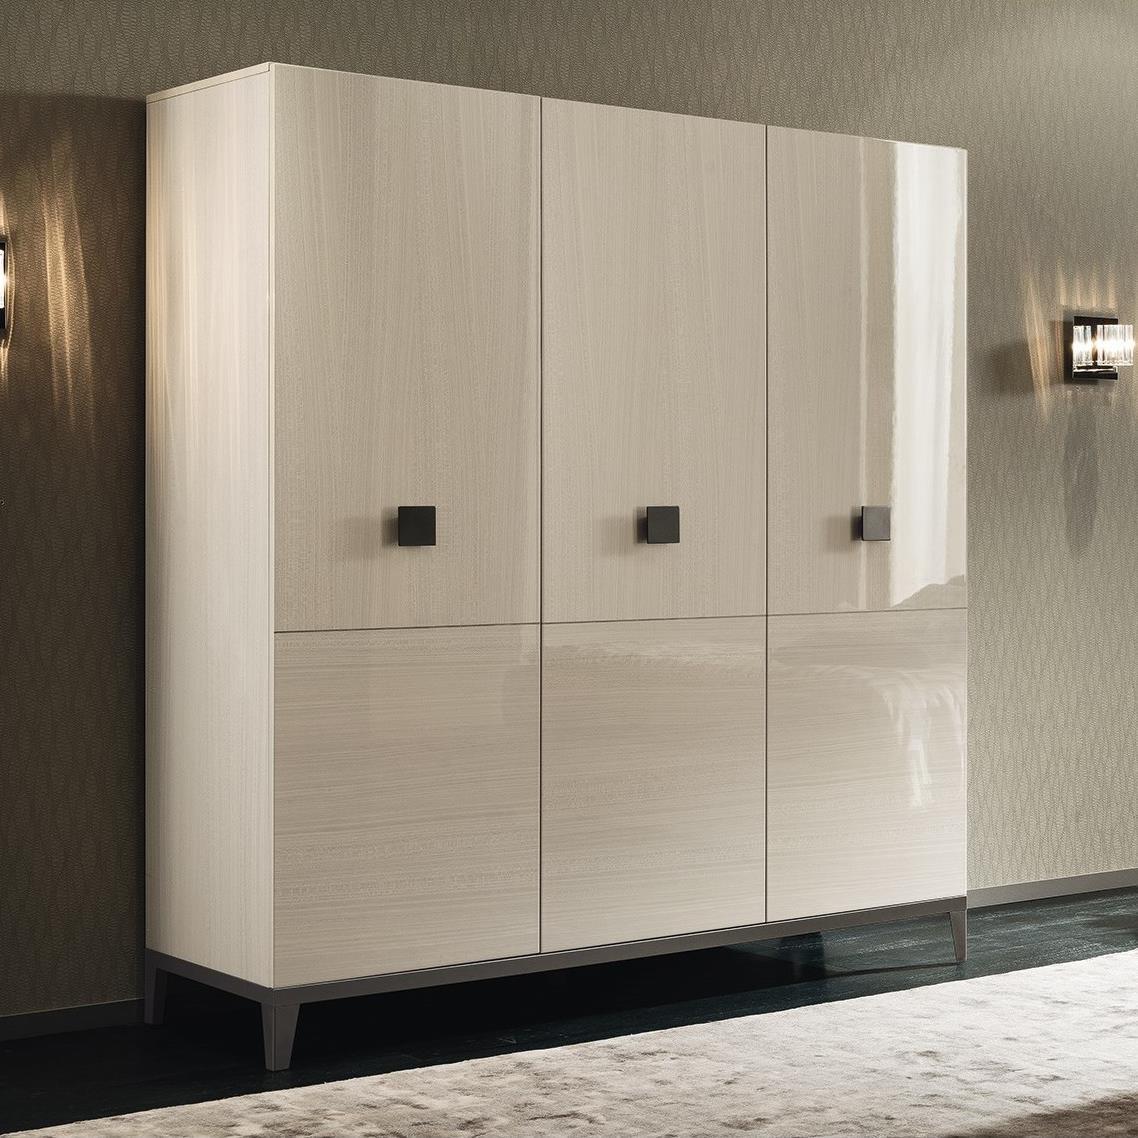 Mont Blanc 3 Door Swinging Wardrobe by Alf Italia at Upper Room Home Furnishings